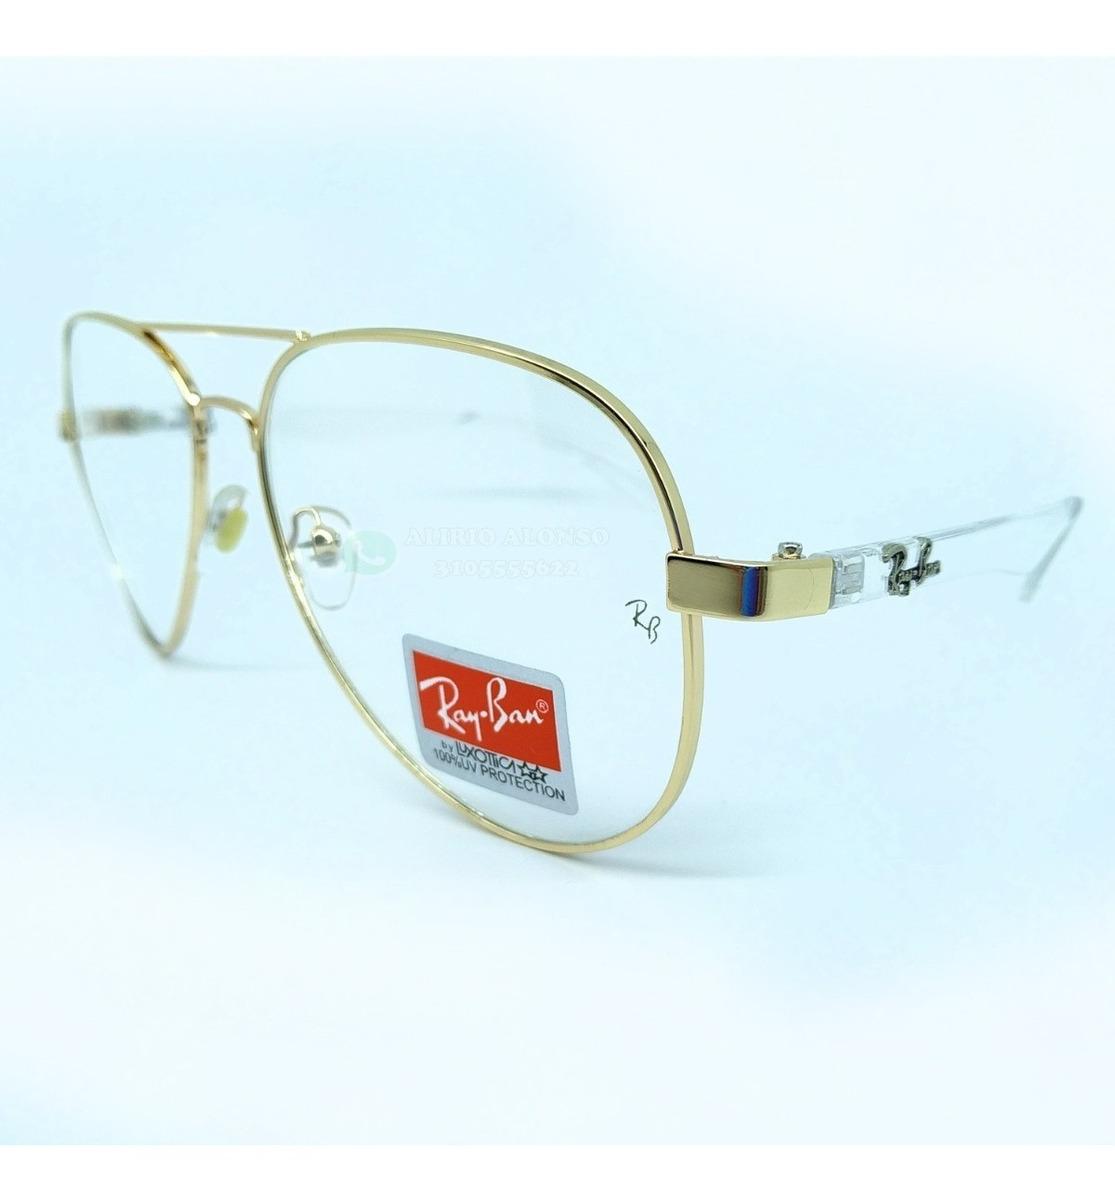 2d535c69b2 gafas ray ban montura piloto aviador transparente 50% off. Cargando zoom.